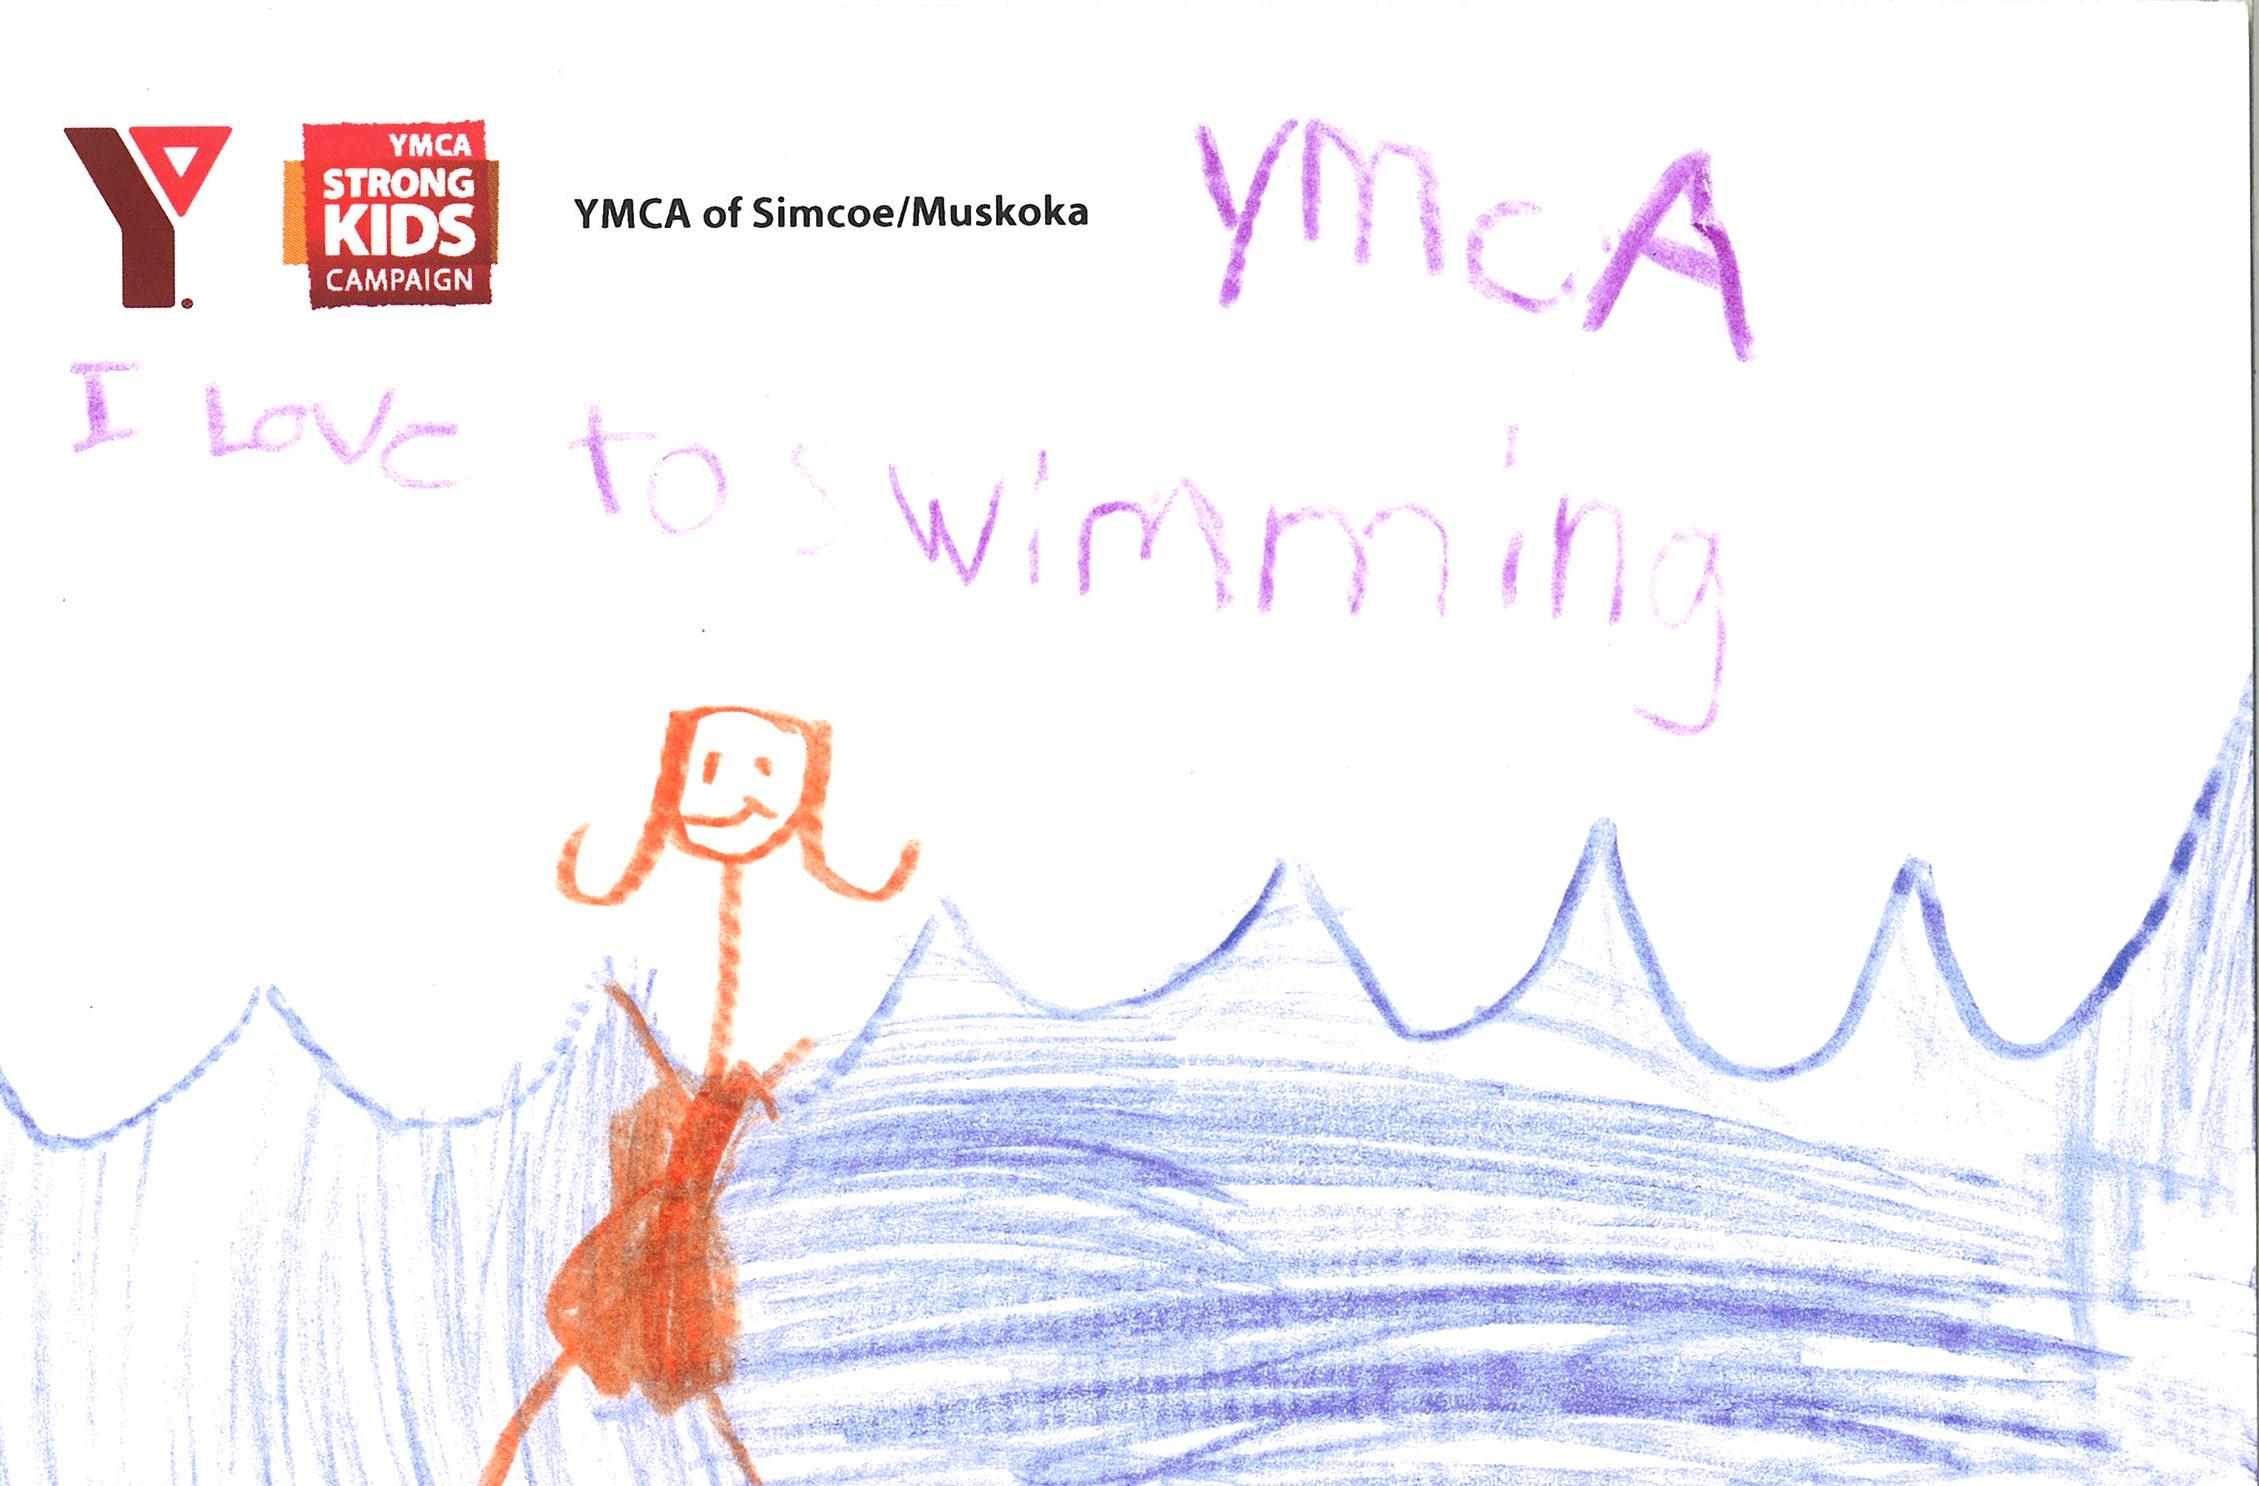 Swimming at the YMCA of Simcoe/Muskoka